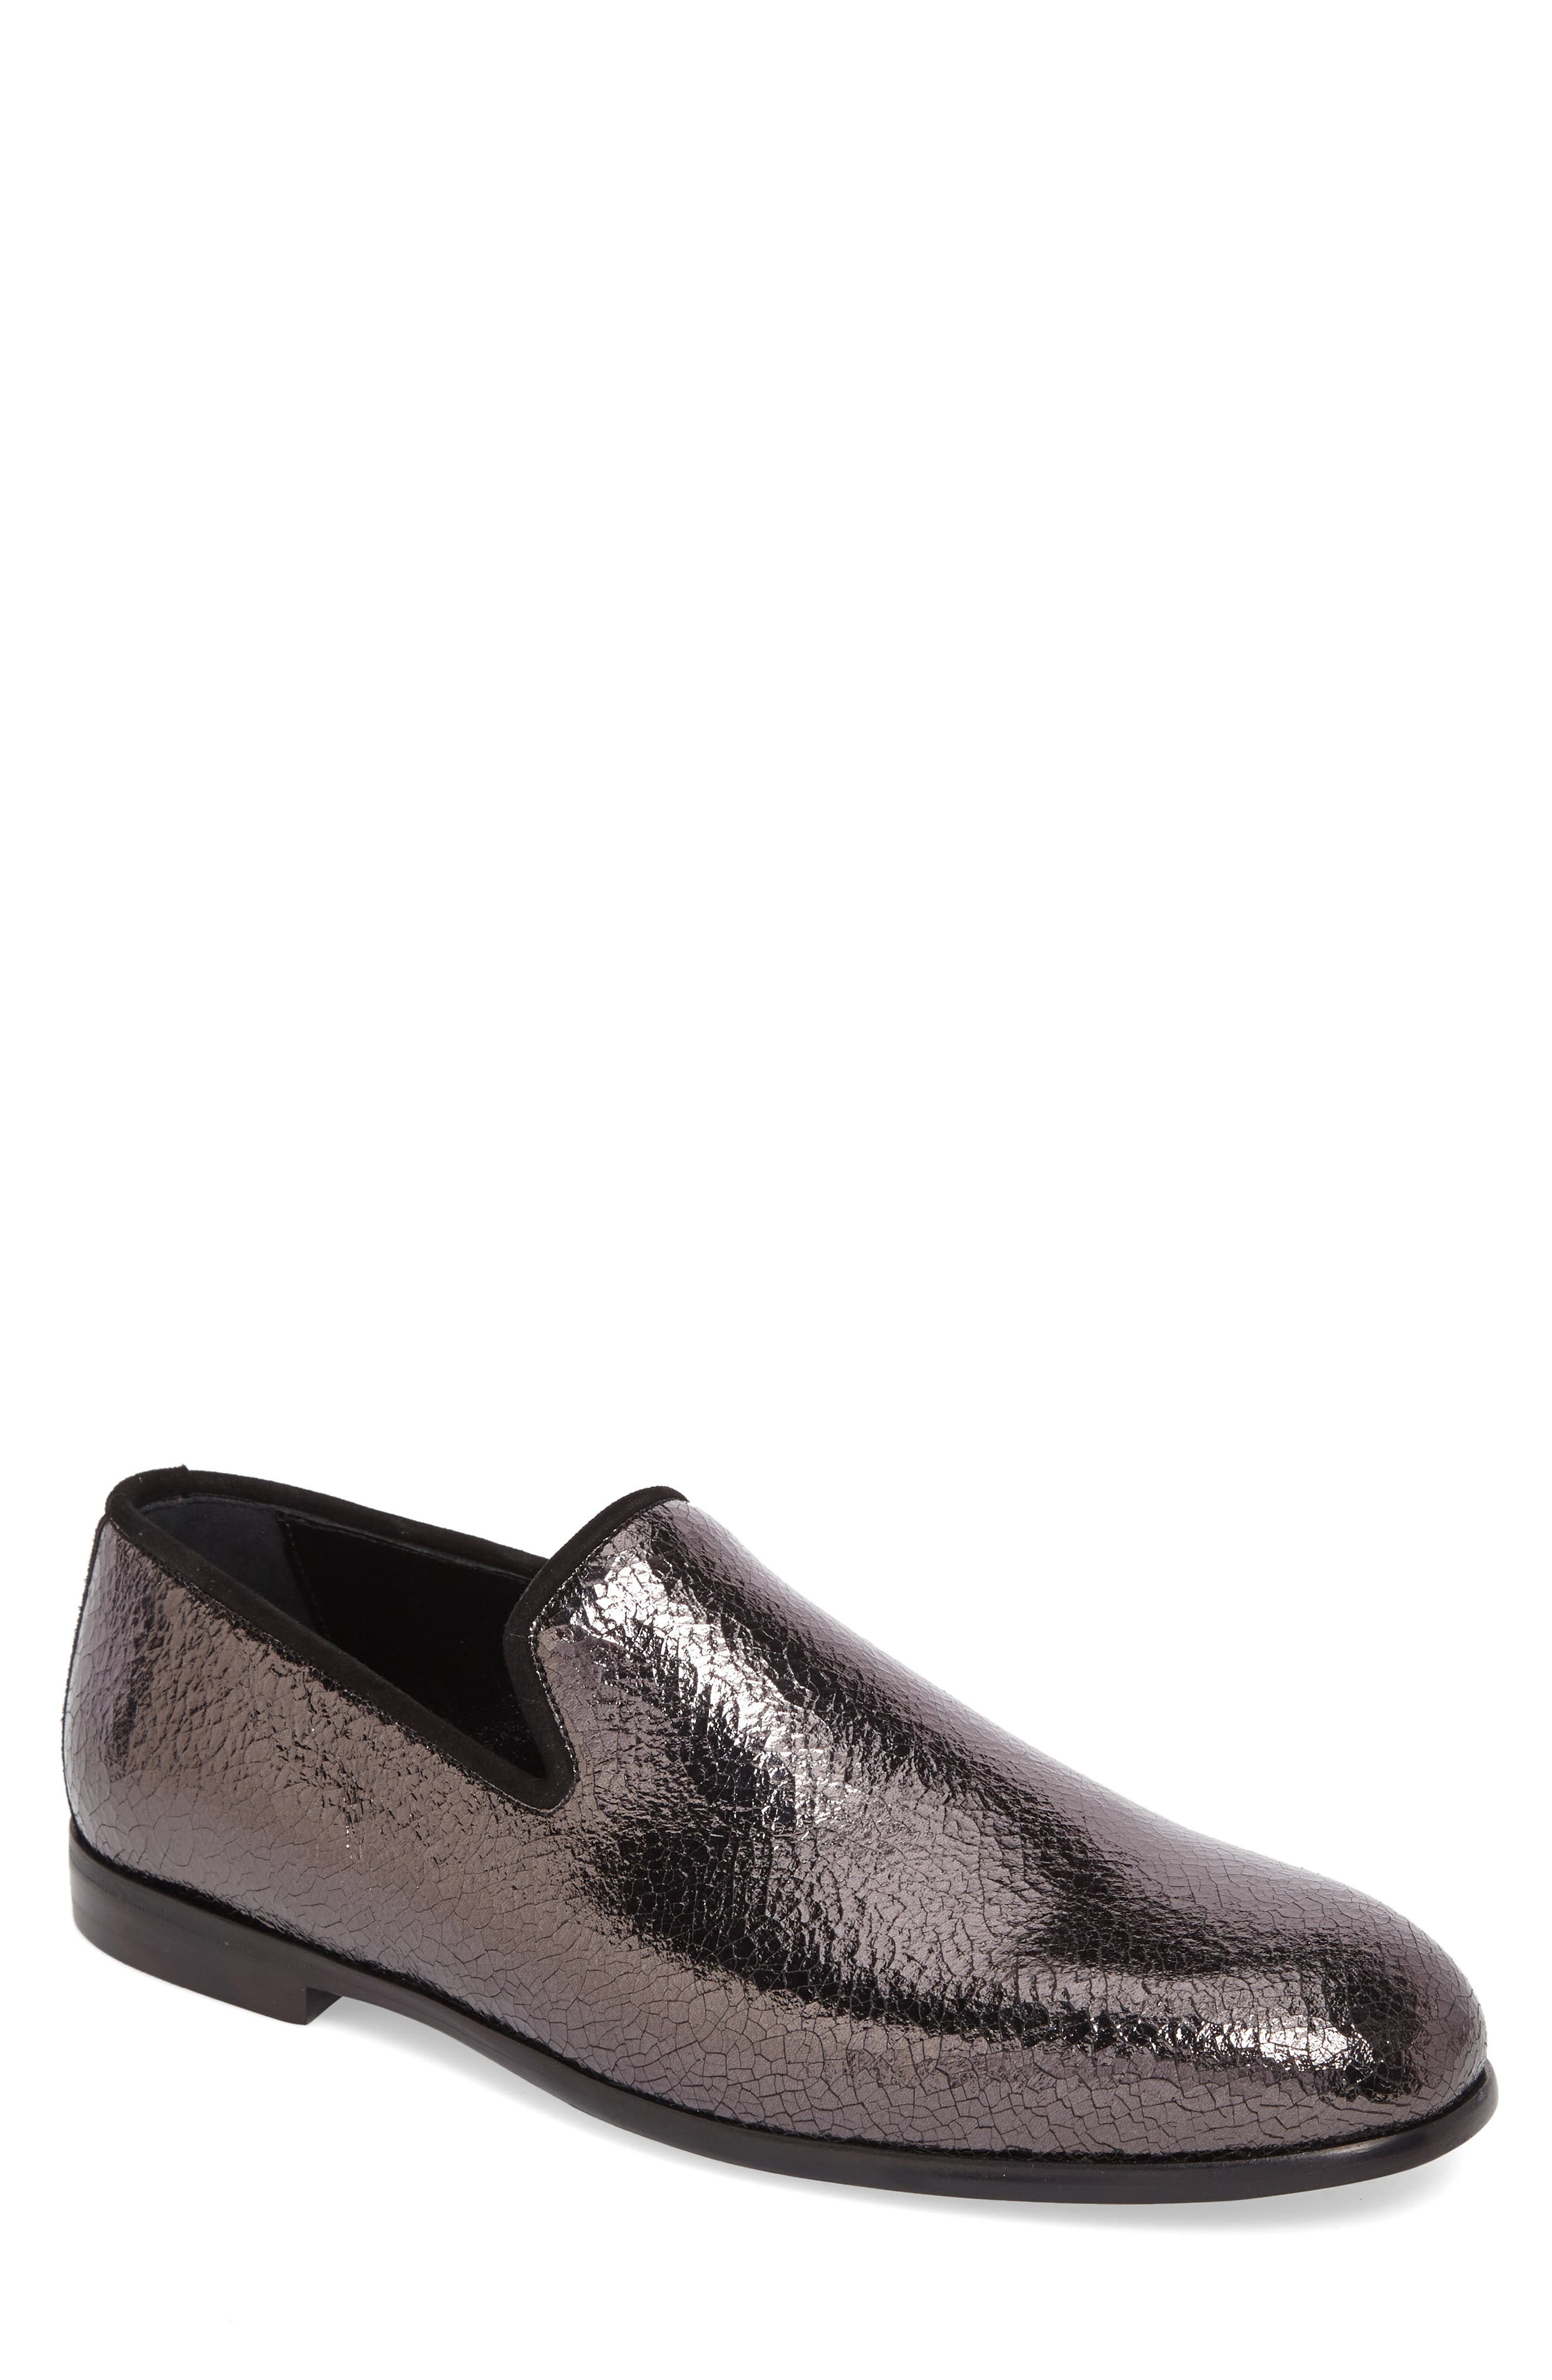 Marlo Venetian Loafer,                         Main,                         color,